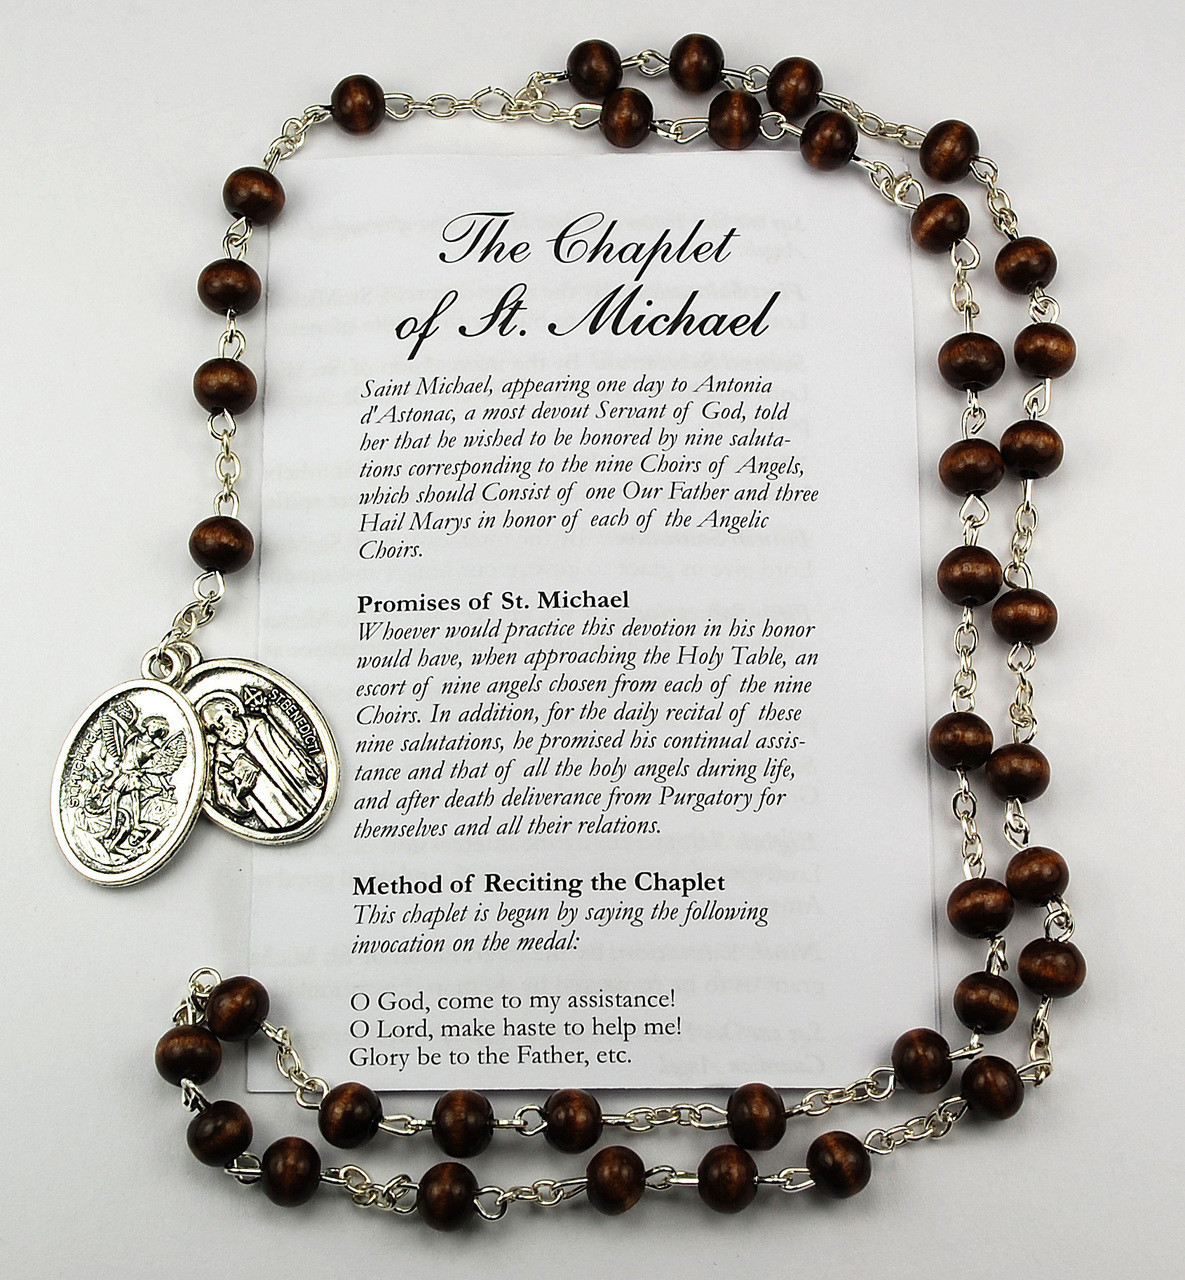 Chaplet of St. Michael